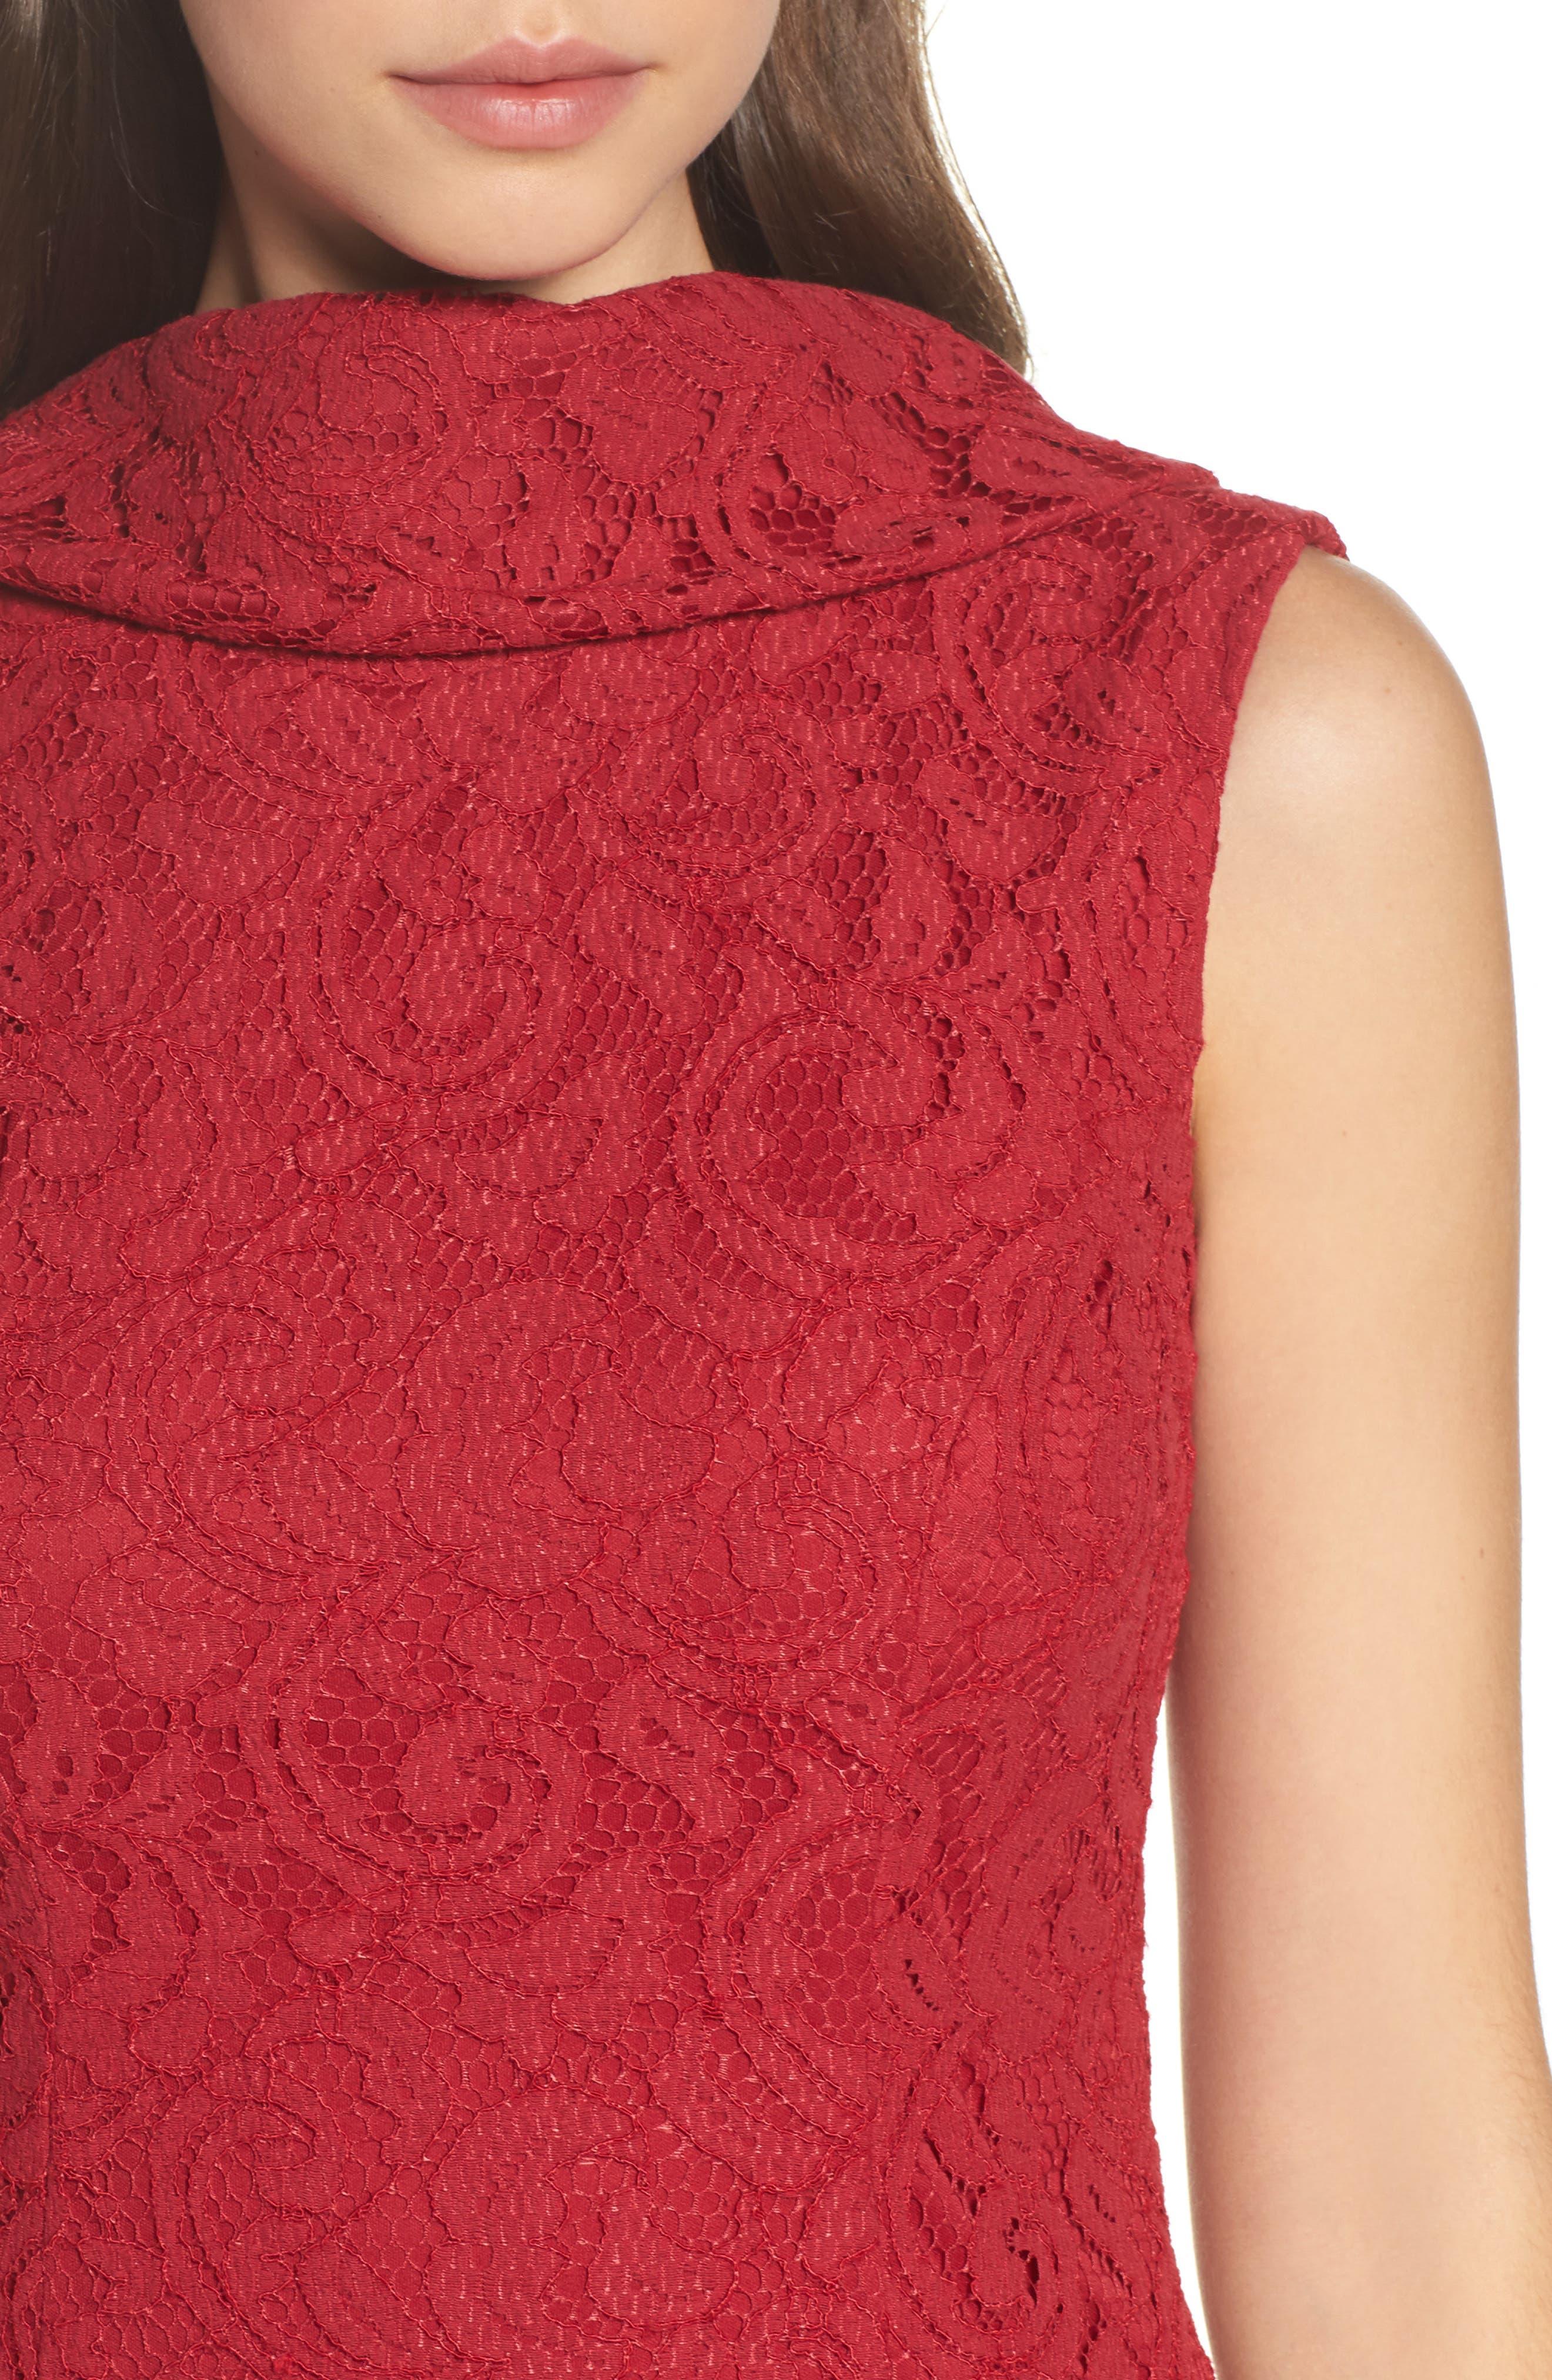 Lace Sheath Dress,                             Alternate thumbnail 4, color,                             Cherry